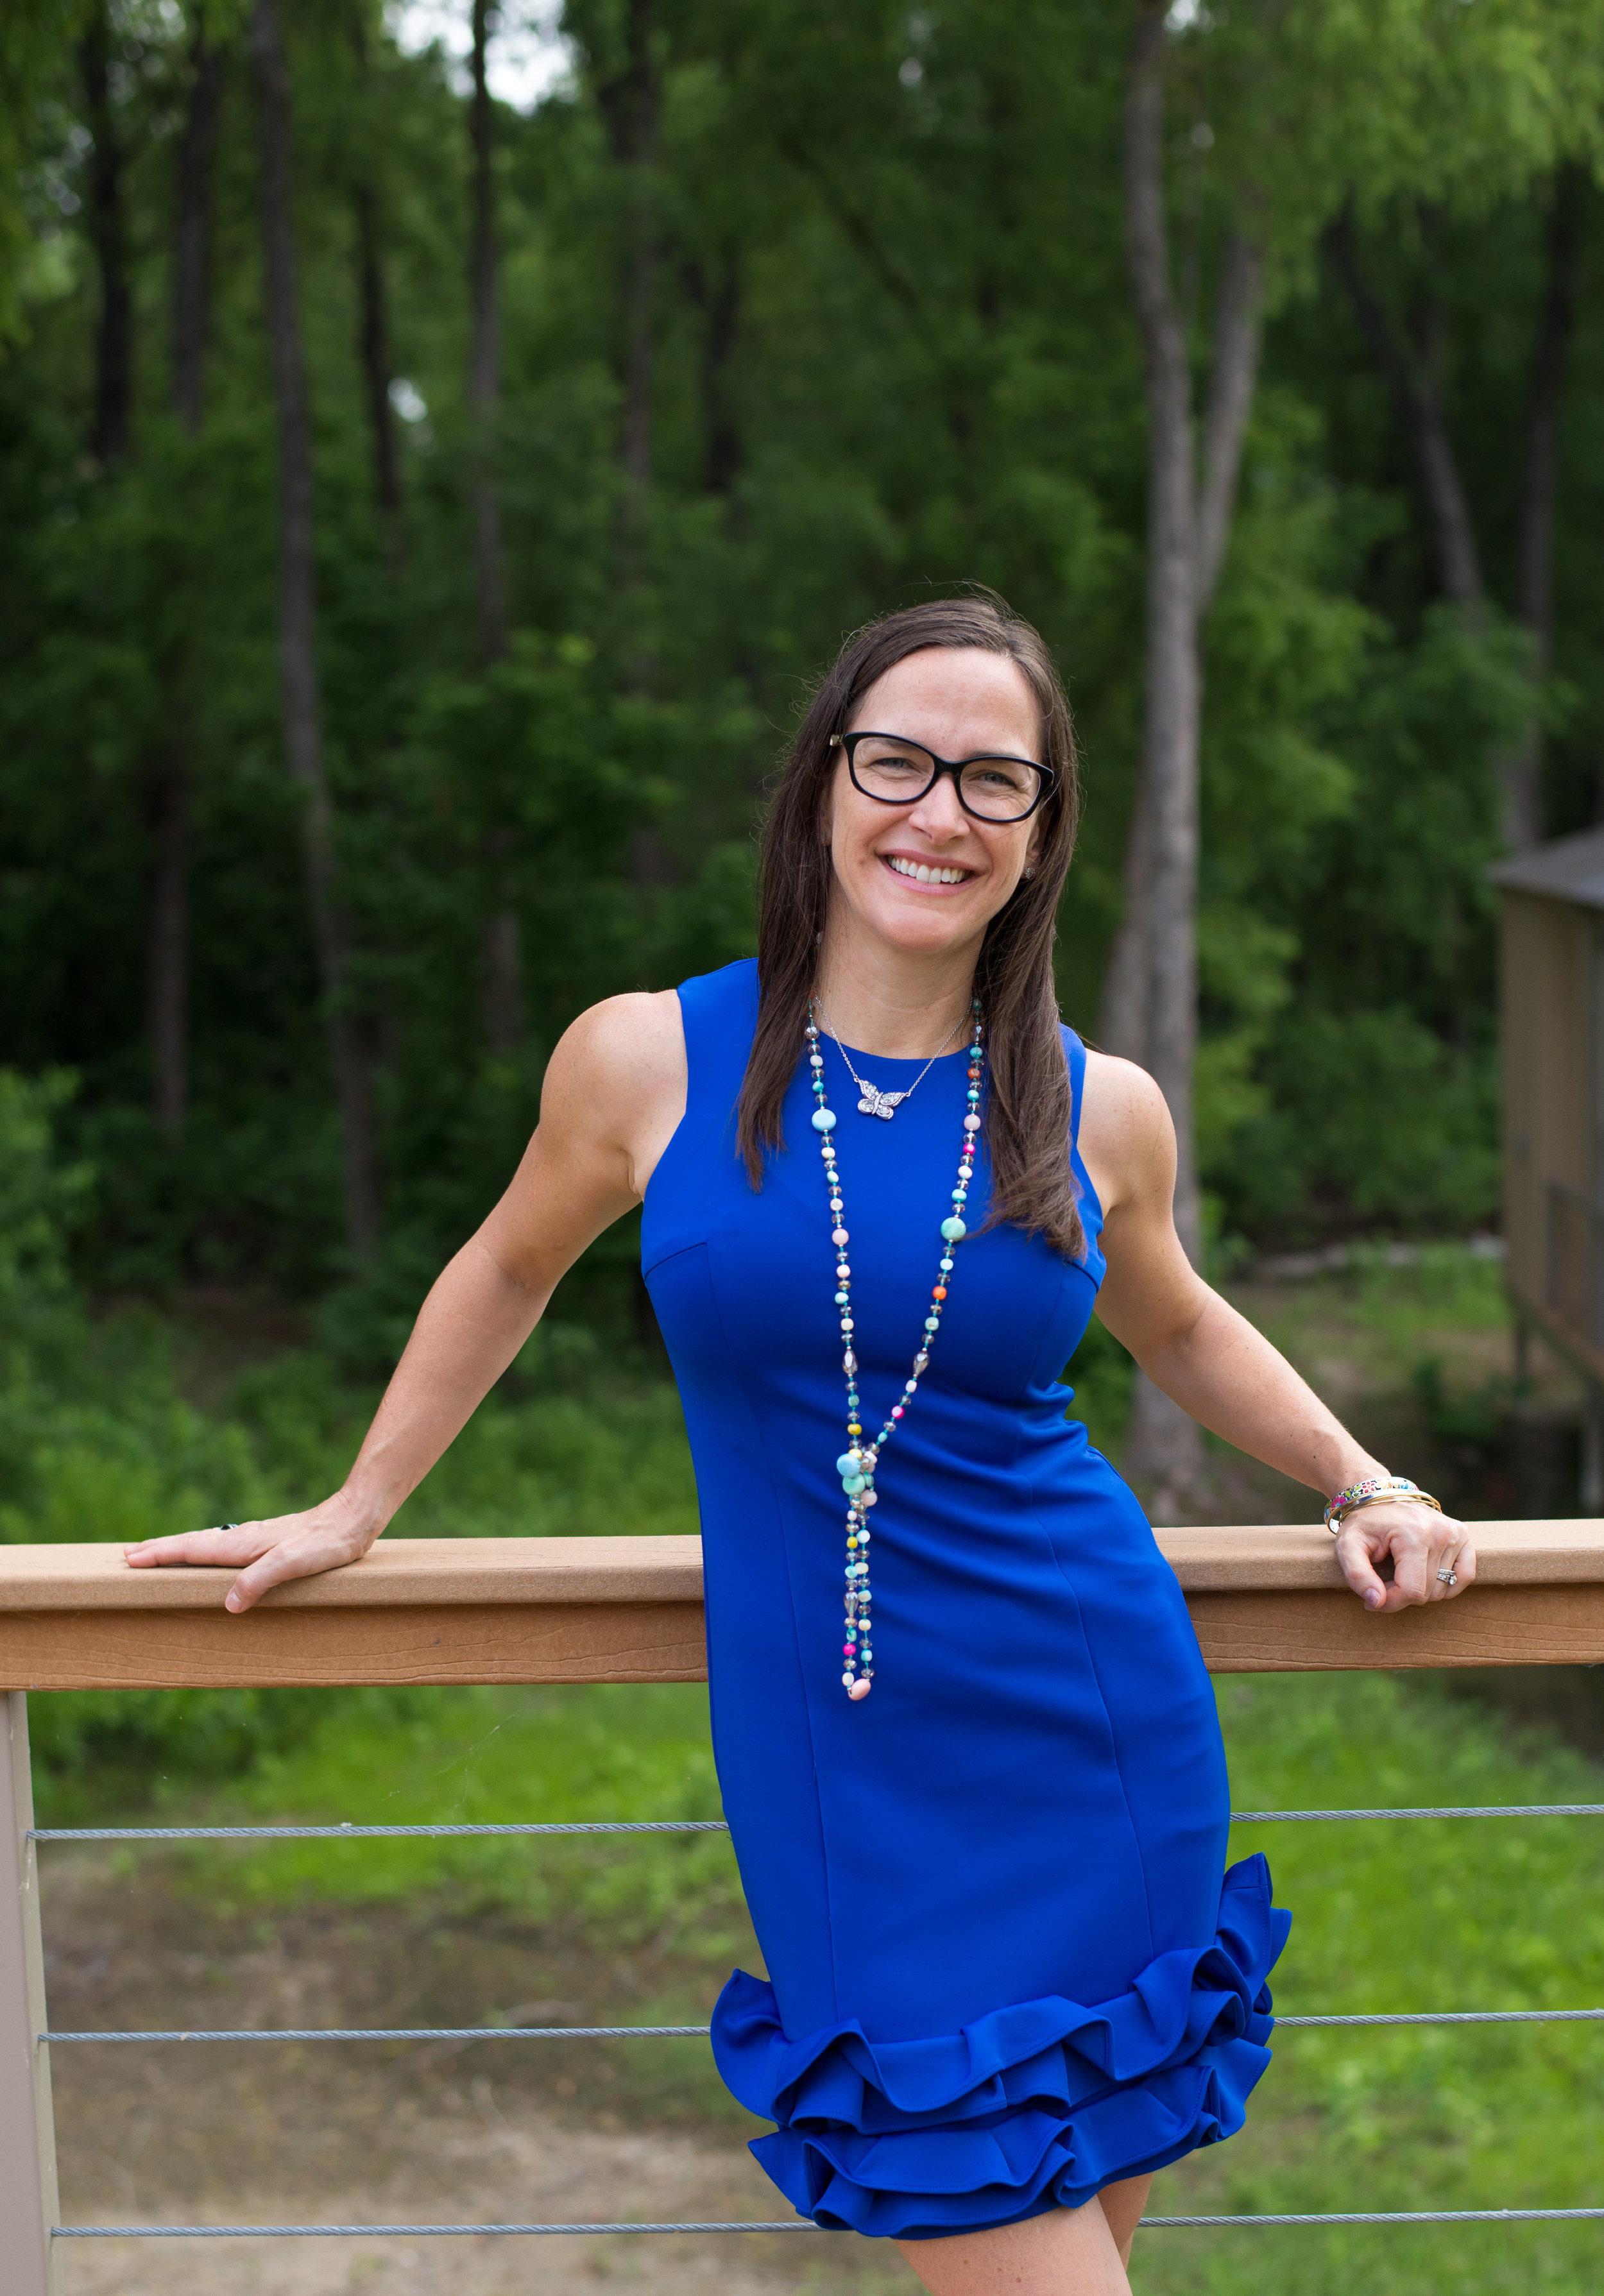 Nicole-Vienneau-Funded-By-Photos030 - Nicole Vienneau.jpg